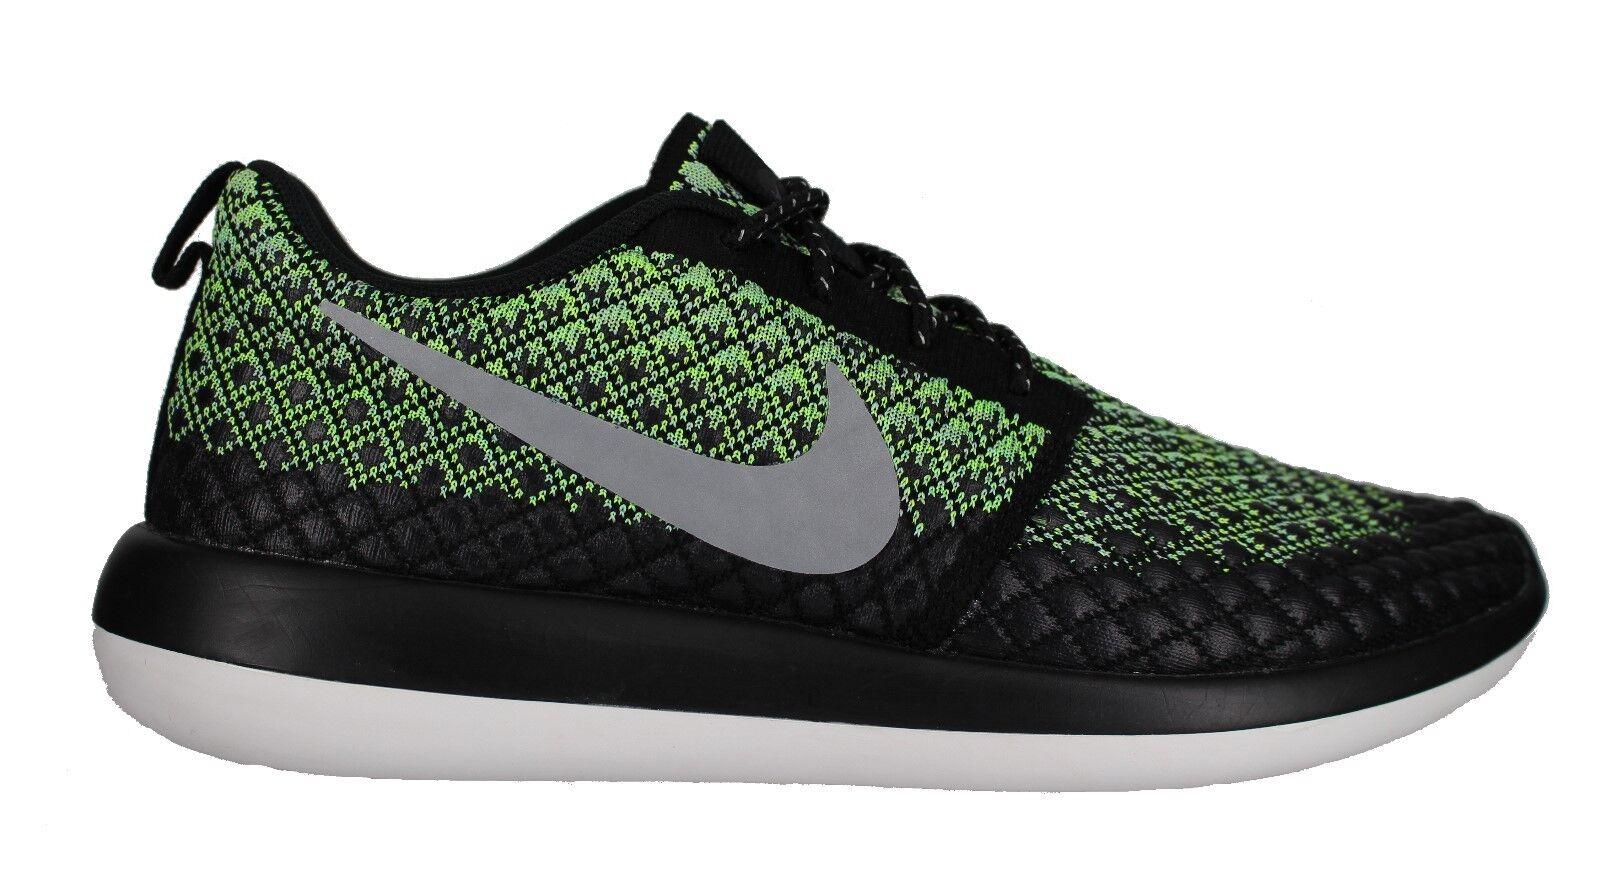 Nike Men's  Roshe Two Flyknit 365  Green - Black Training shoes Size 10.5 New